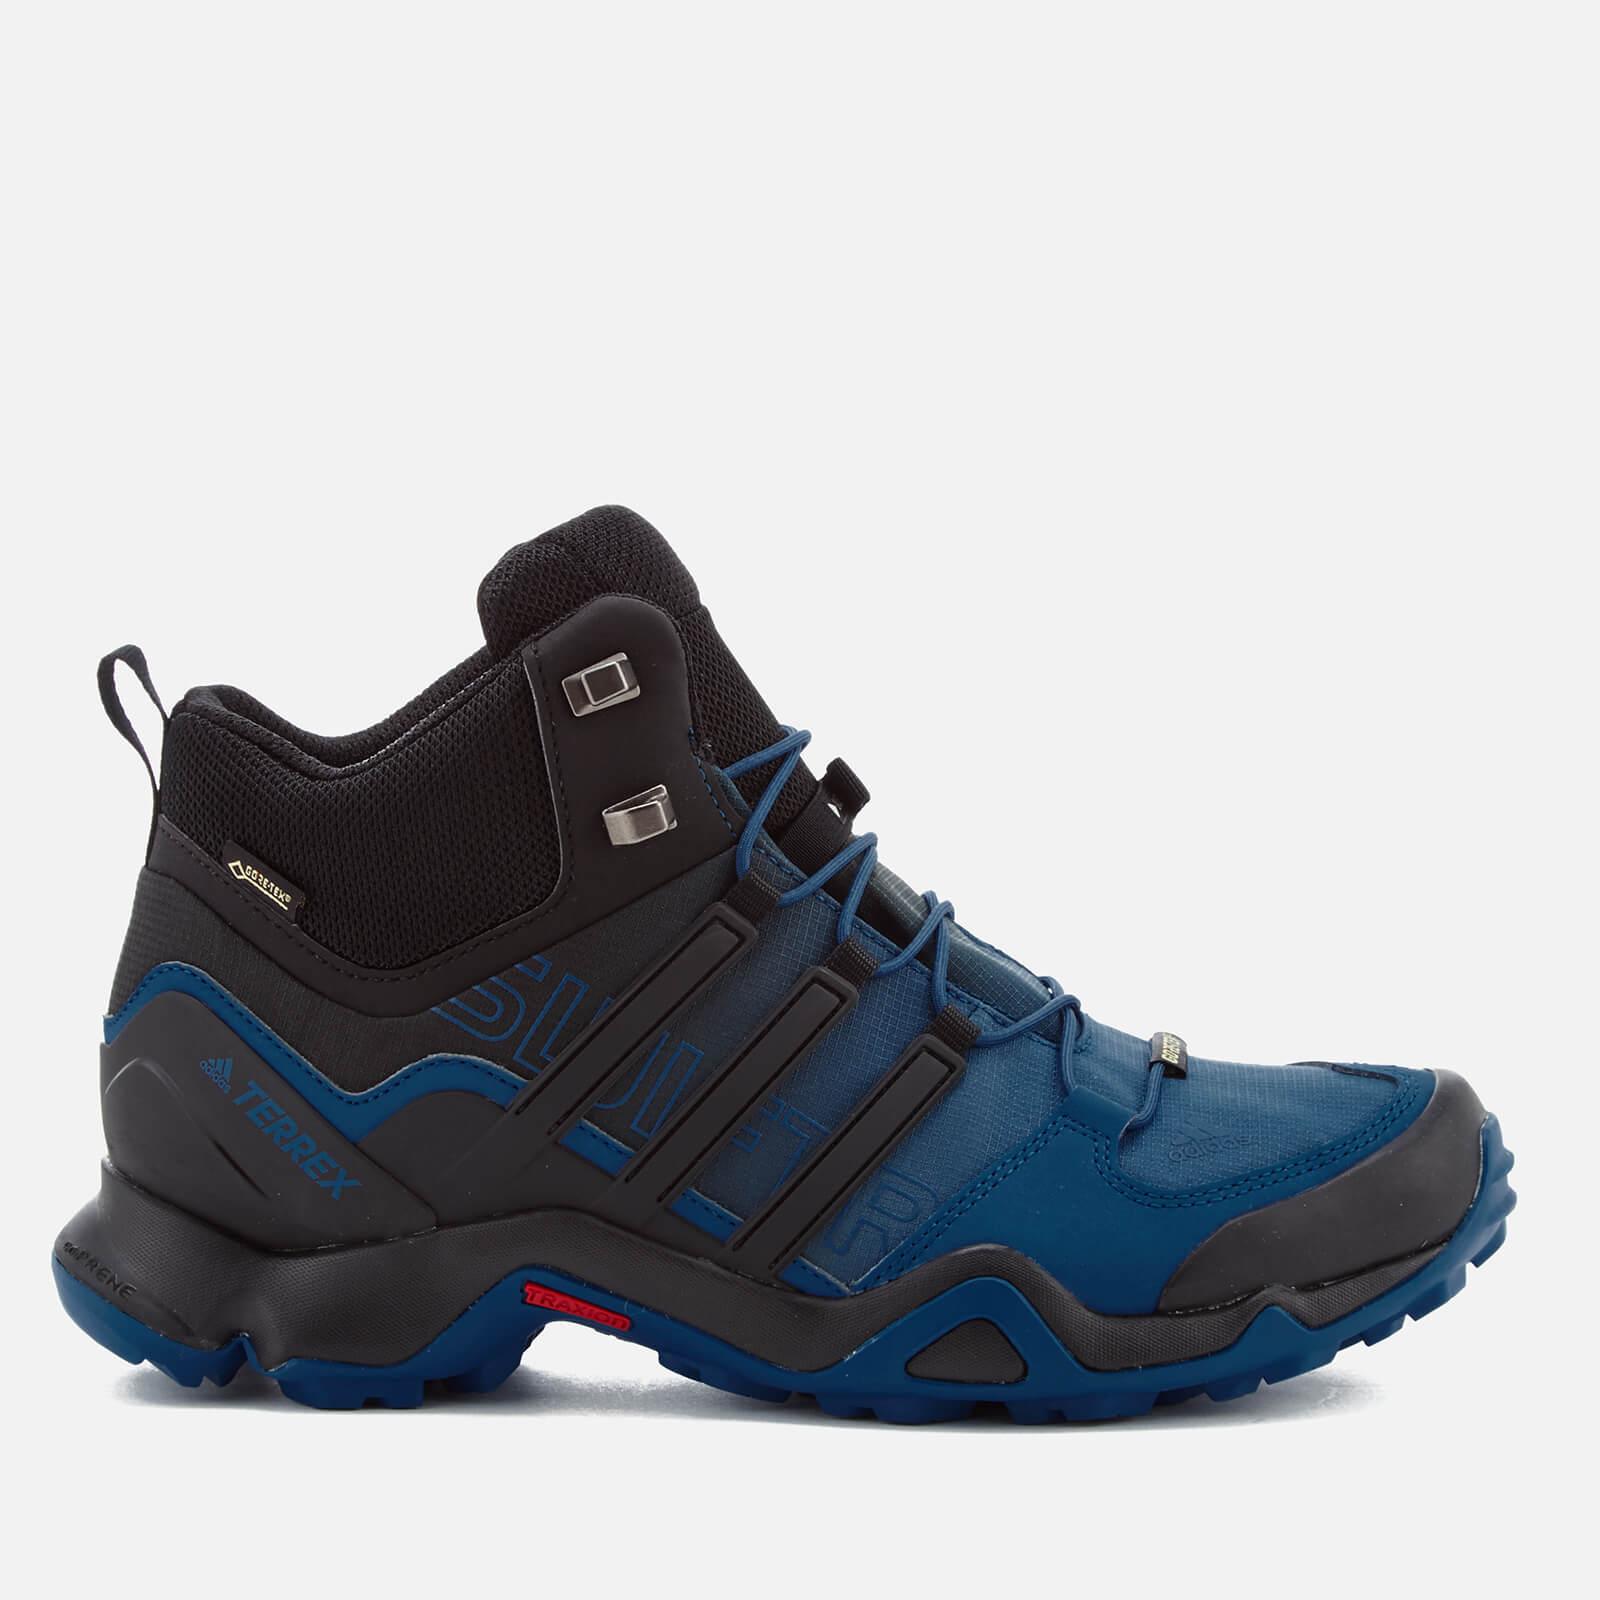 2390d5eee adidas Men s Terrex Swift R GORE-TEX Mid Boots - Core Blue Mens Footwear